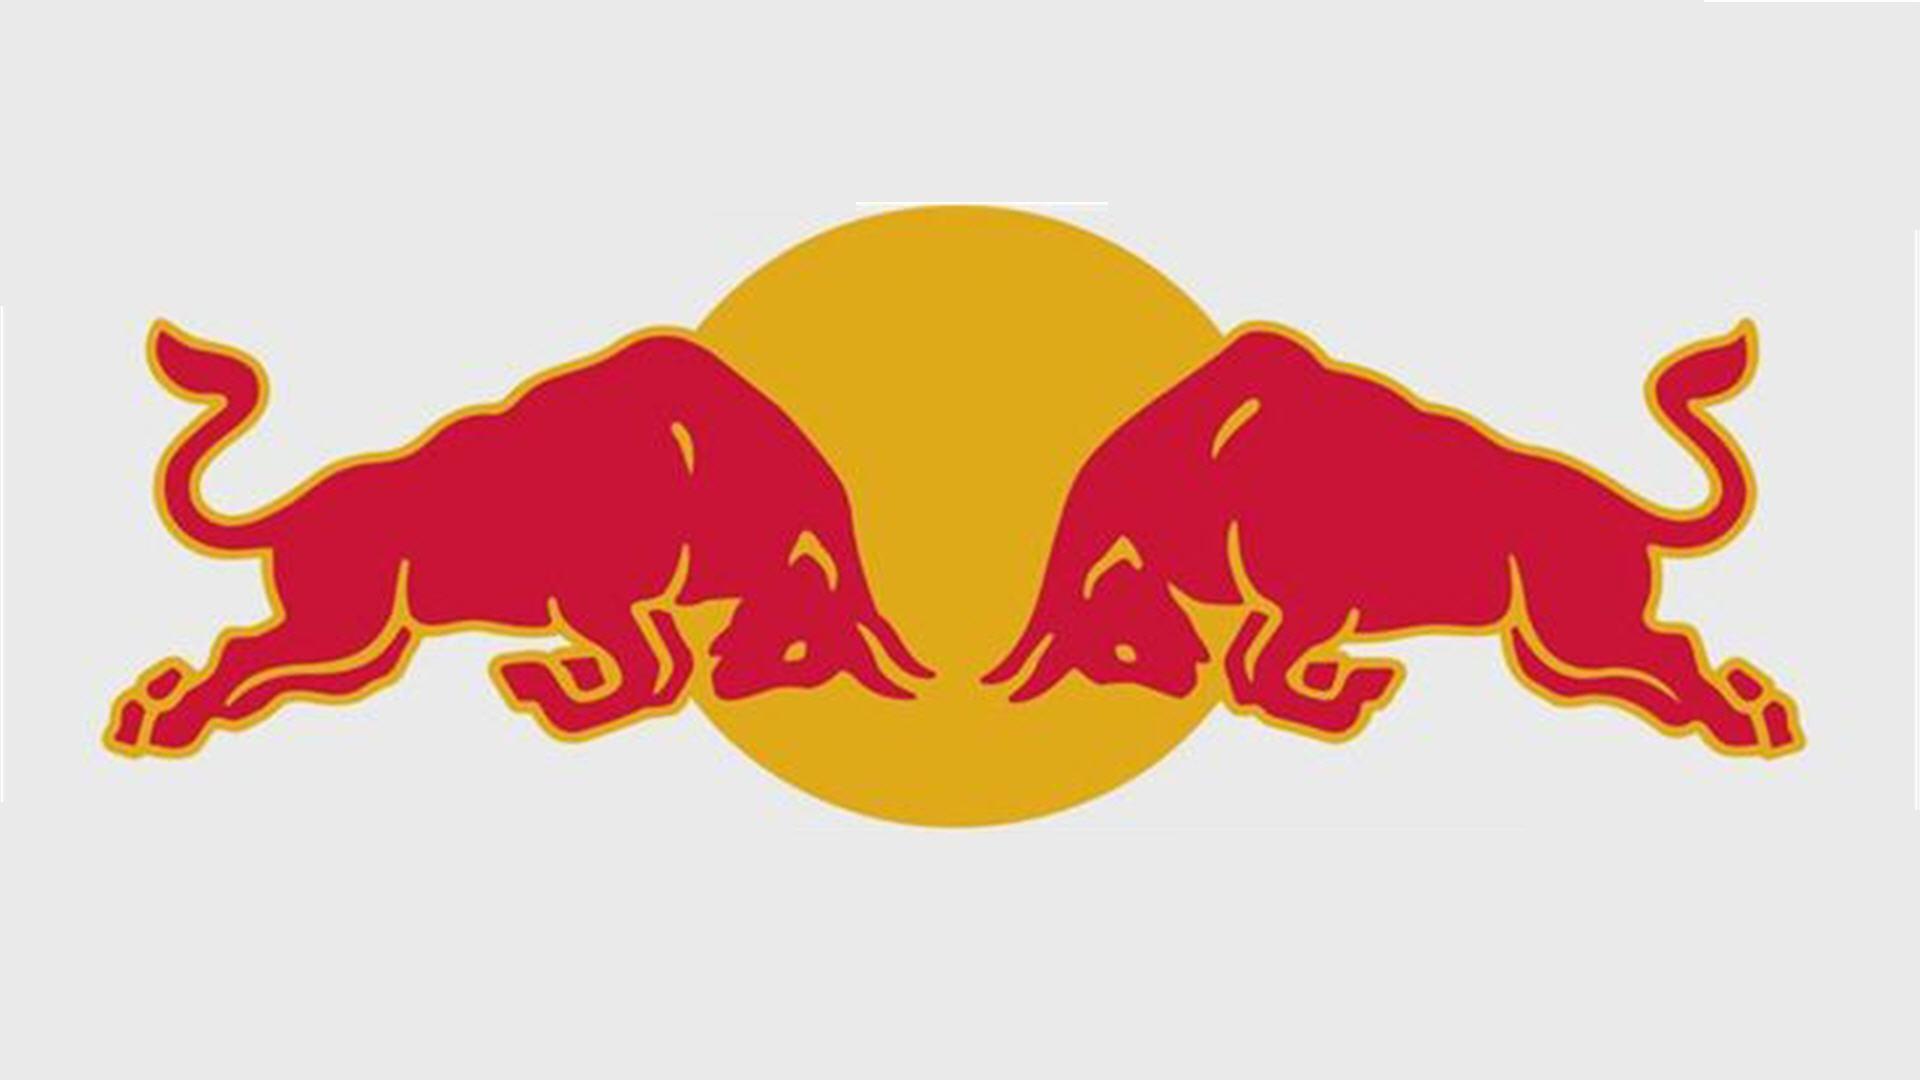 Amazing Logo Wallpaper HD Red Bull Image Gallery Free Download Logo